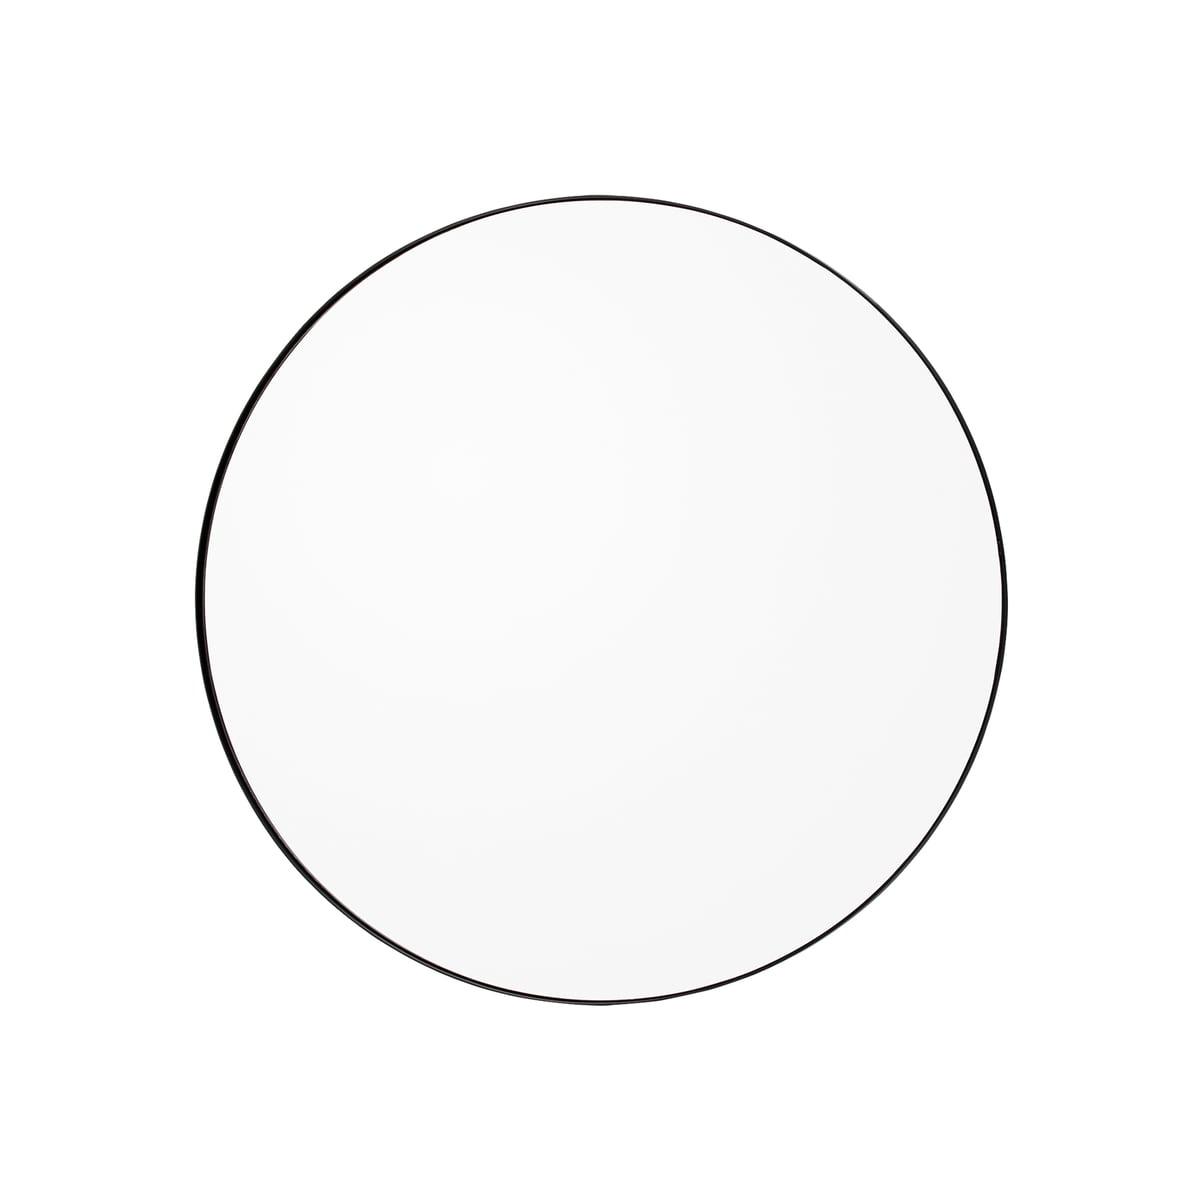 AYTM - Circum Wandspiegel medium, Ø 90 cm, schwarz / klar | Flur & Diele | Schwarz | AYTM